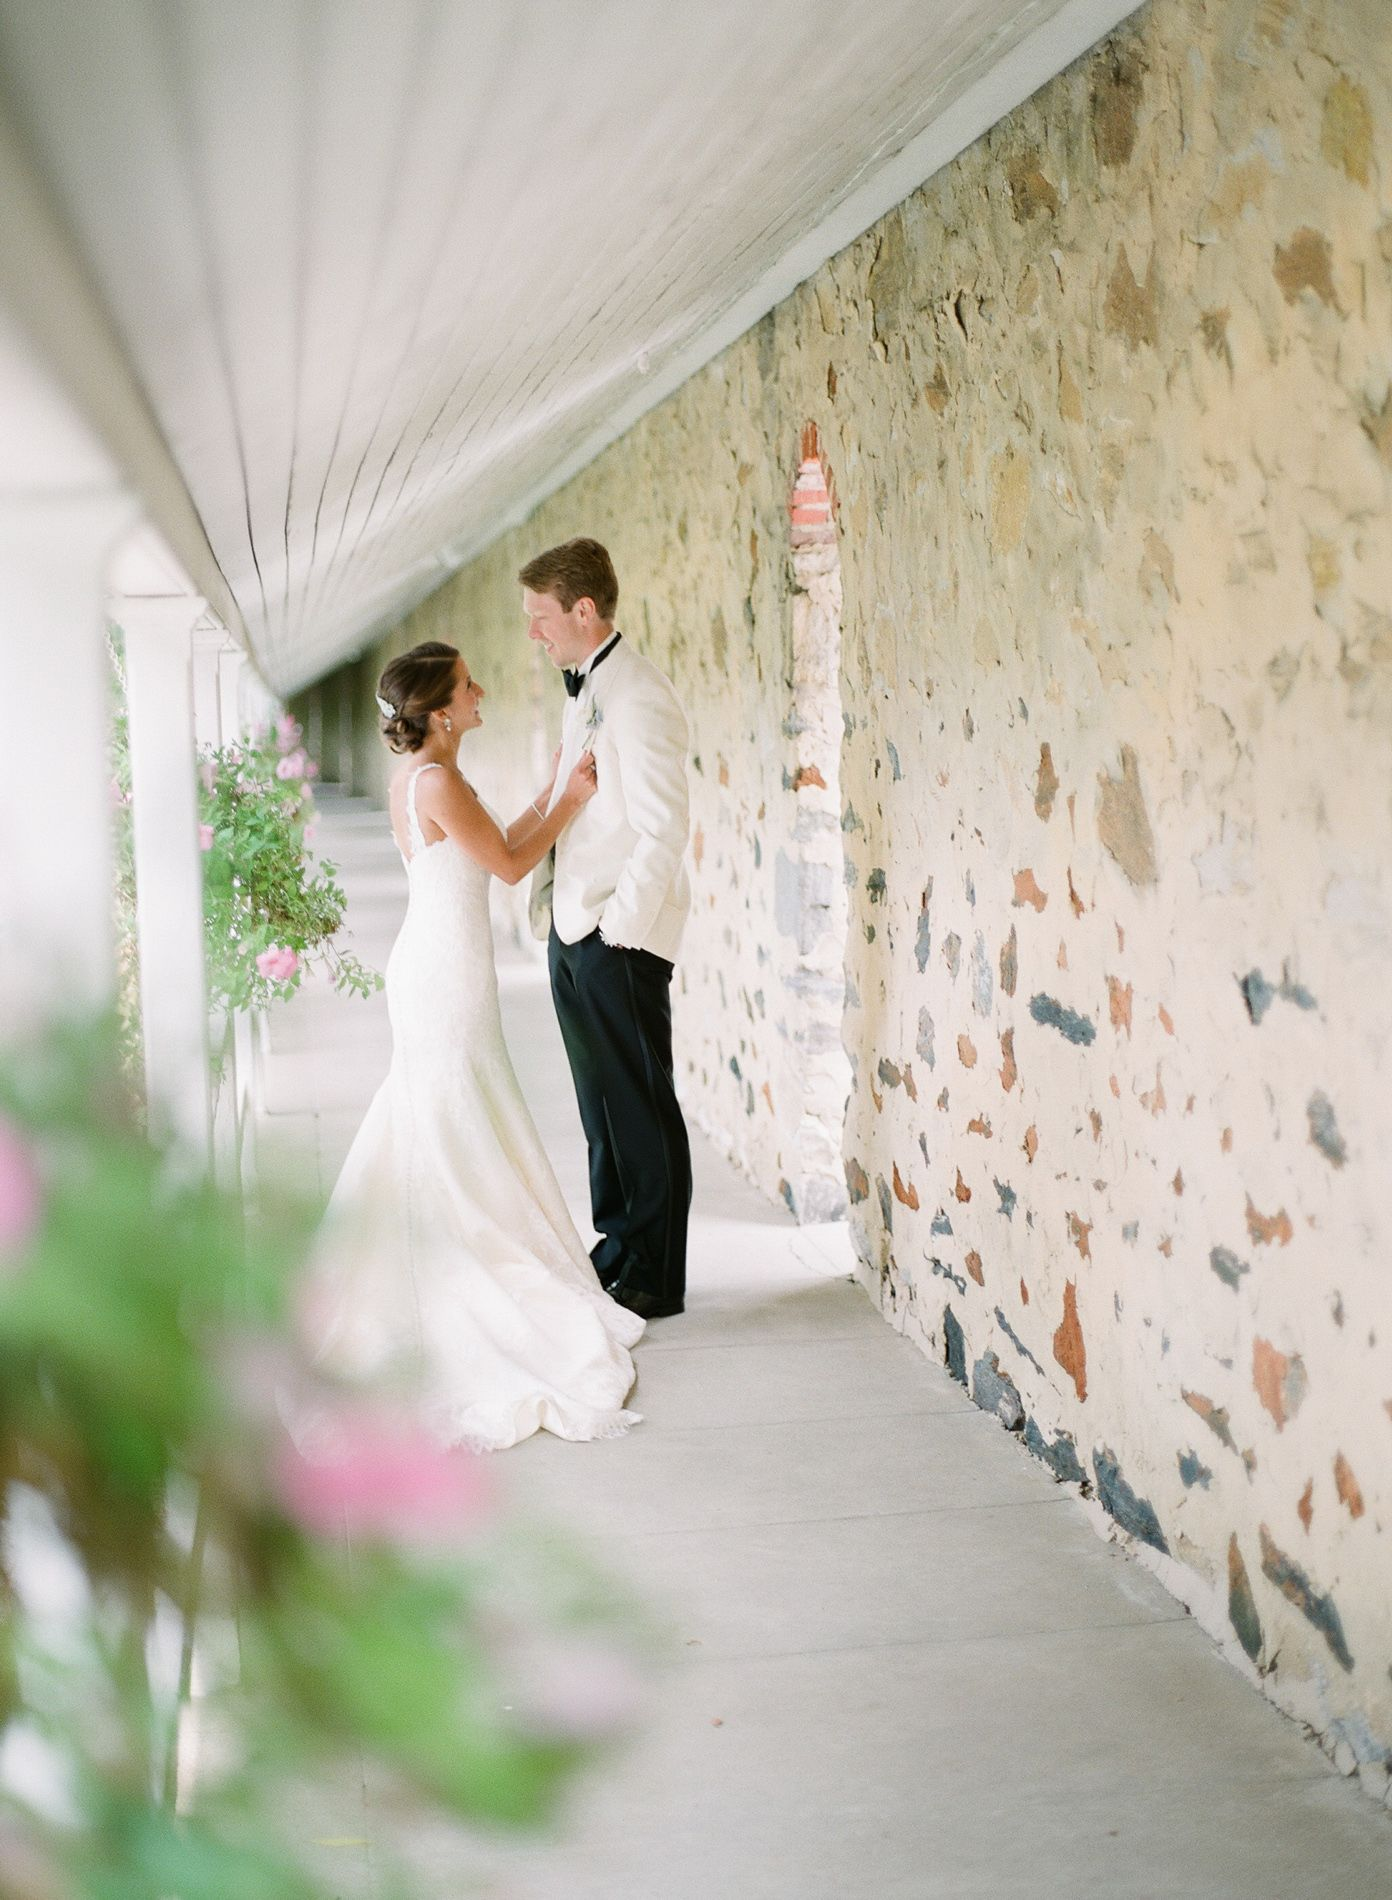 Baltimore country club wedding film photographer baltimore wedding